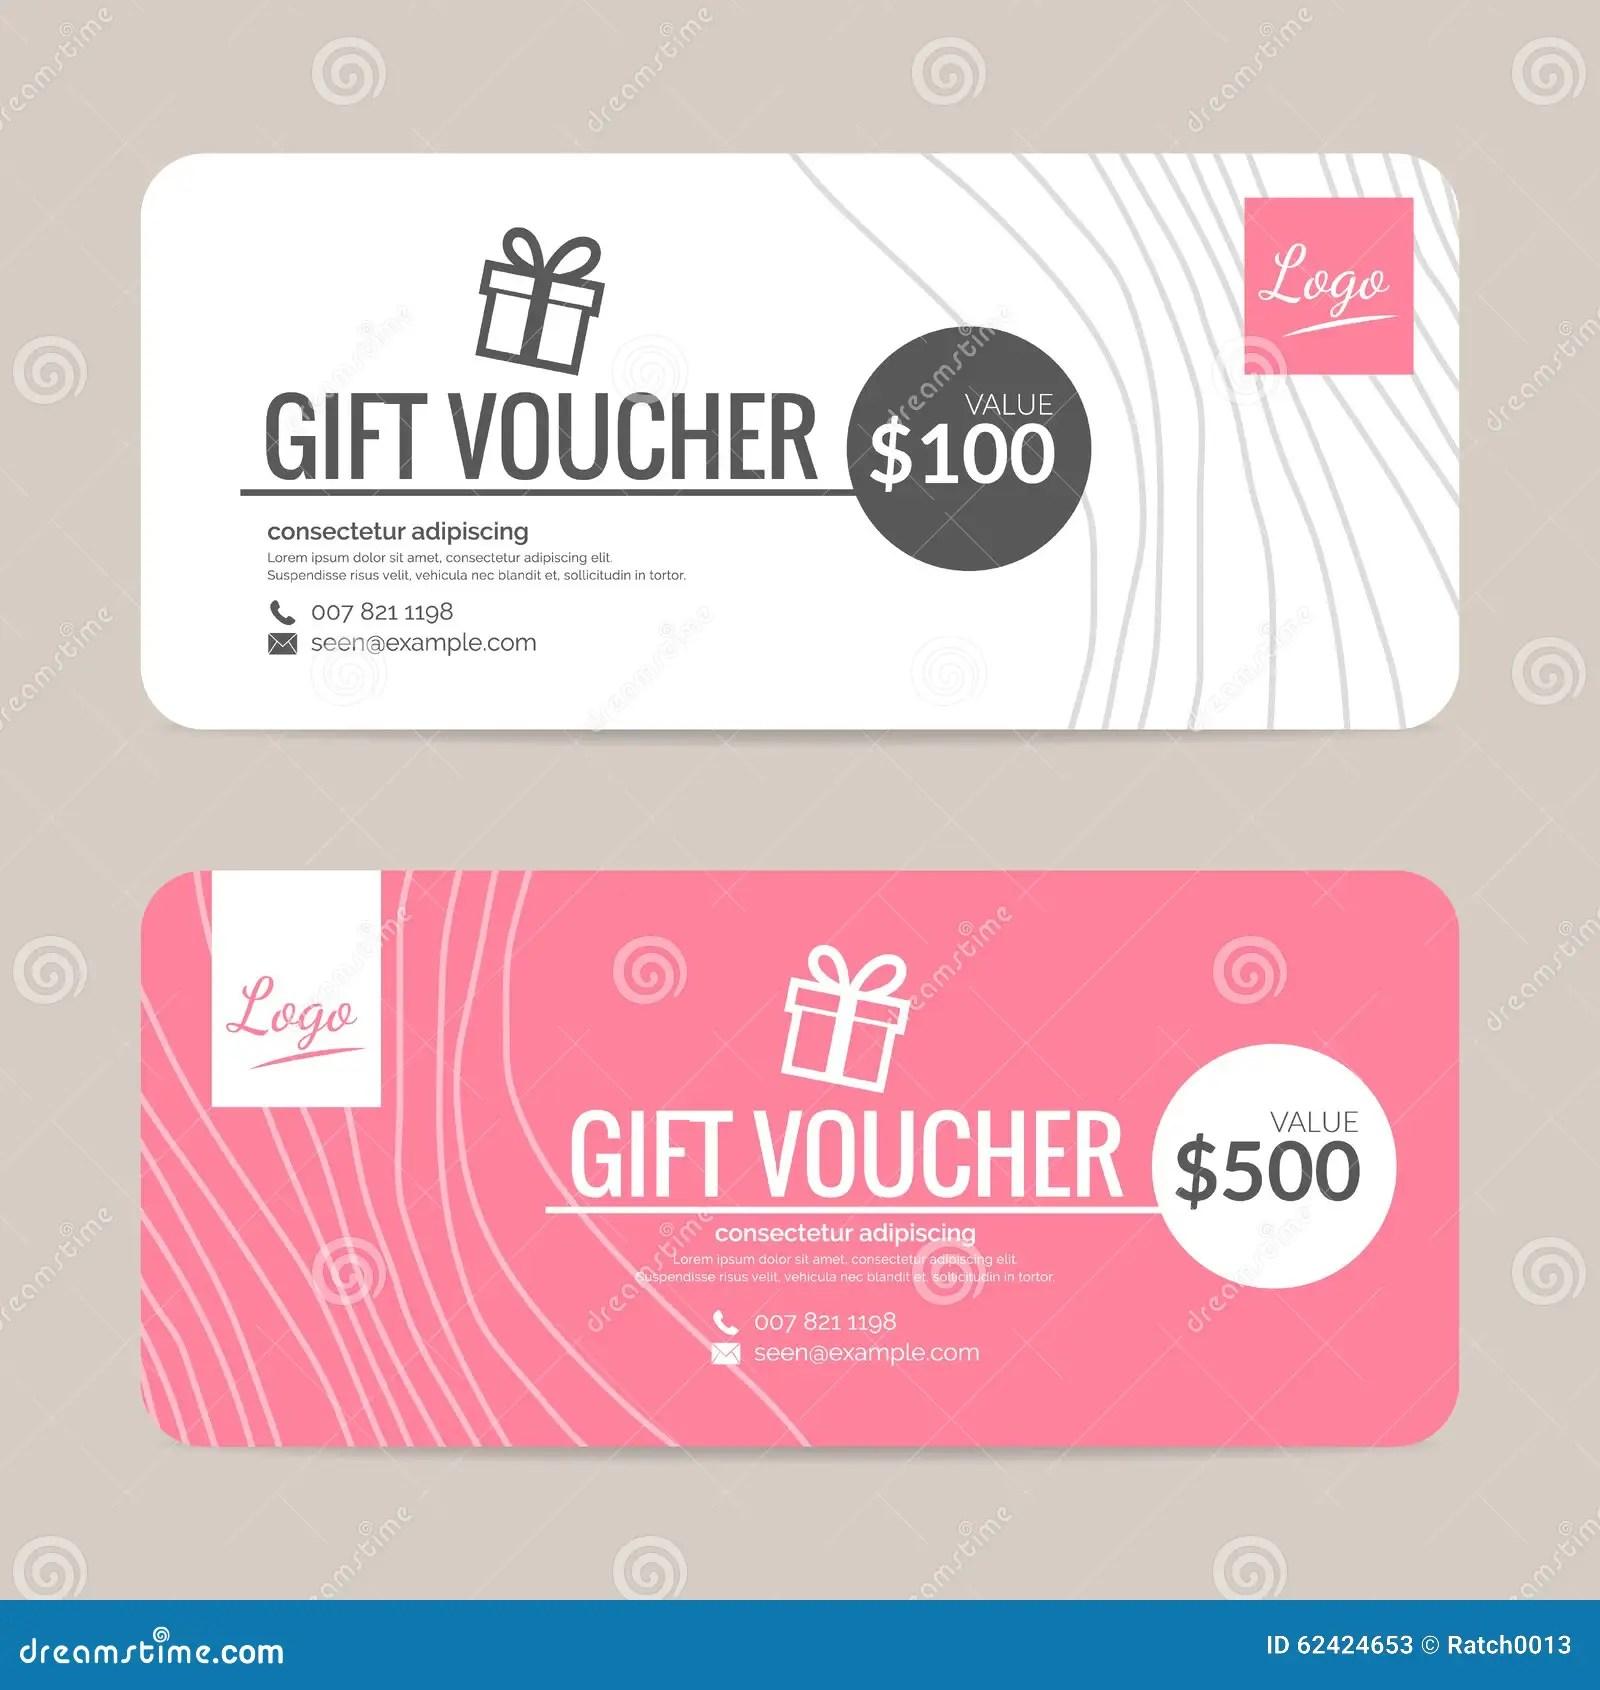 Gift Voucher Format Sample template feedback form wedding guest – Gift Voucher Format Sample